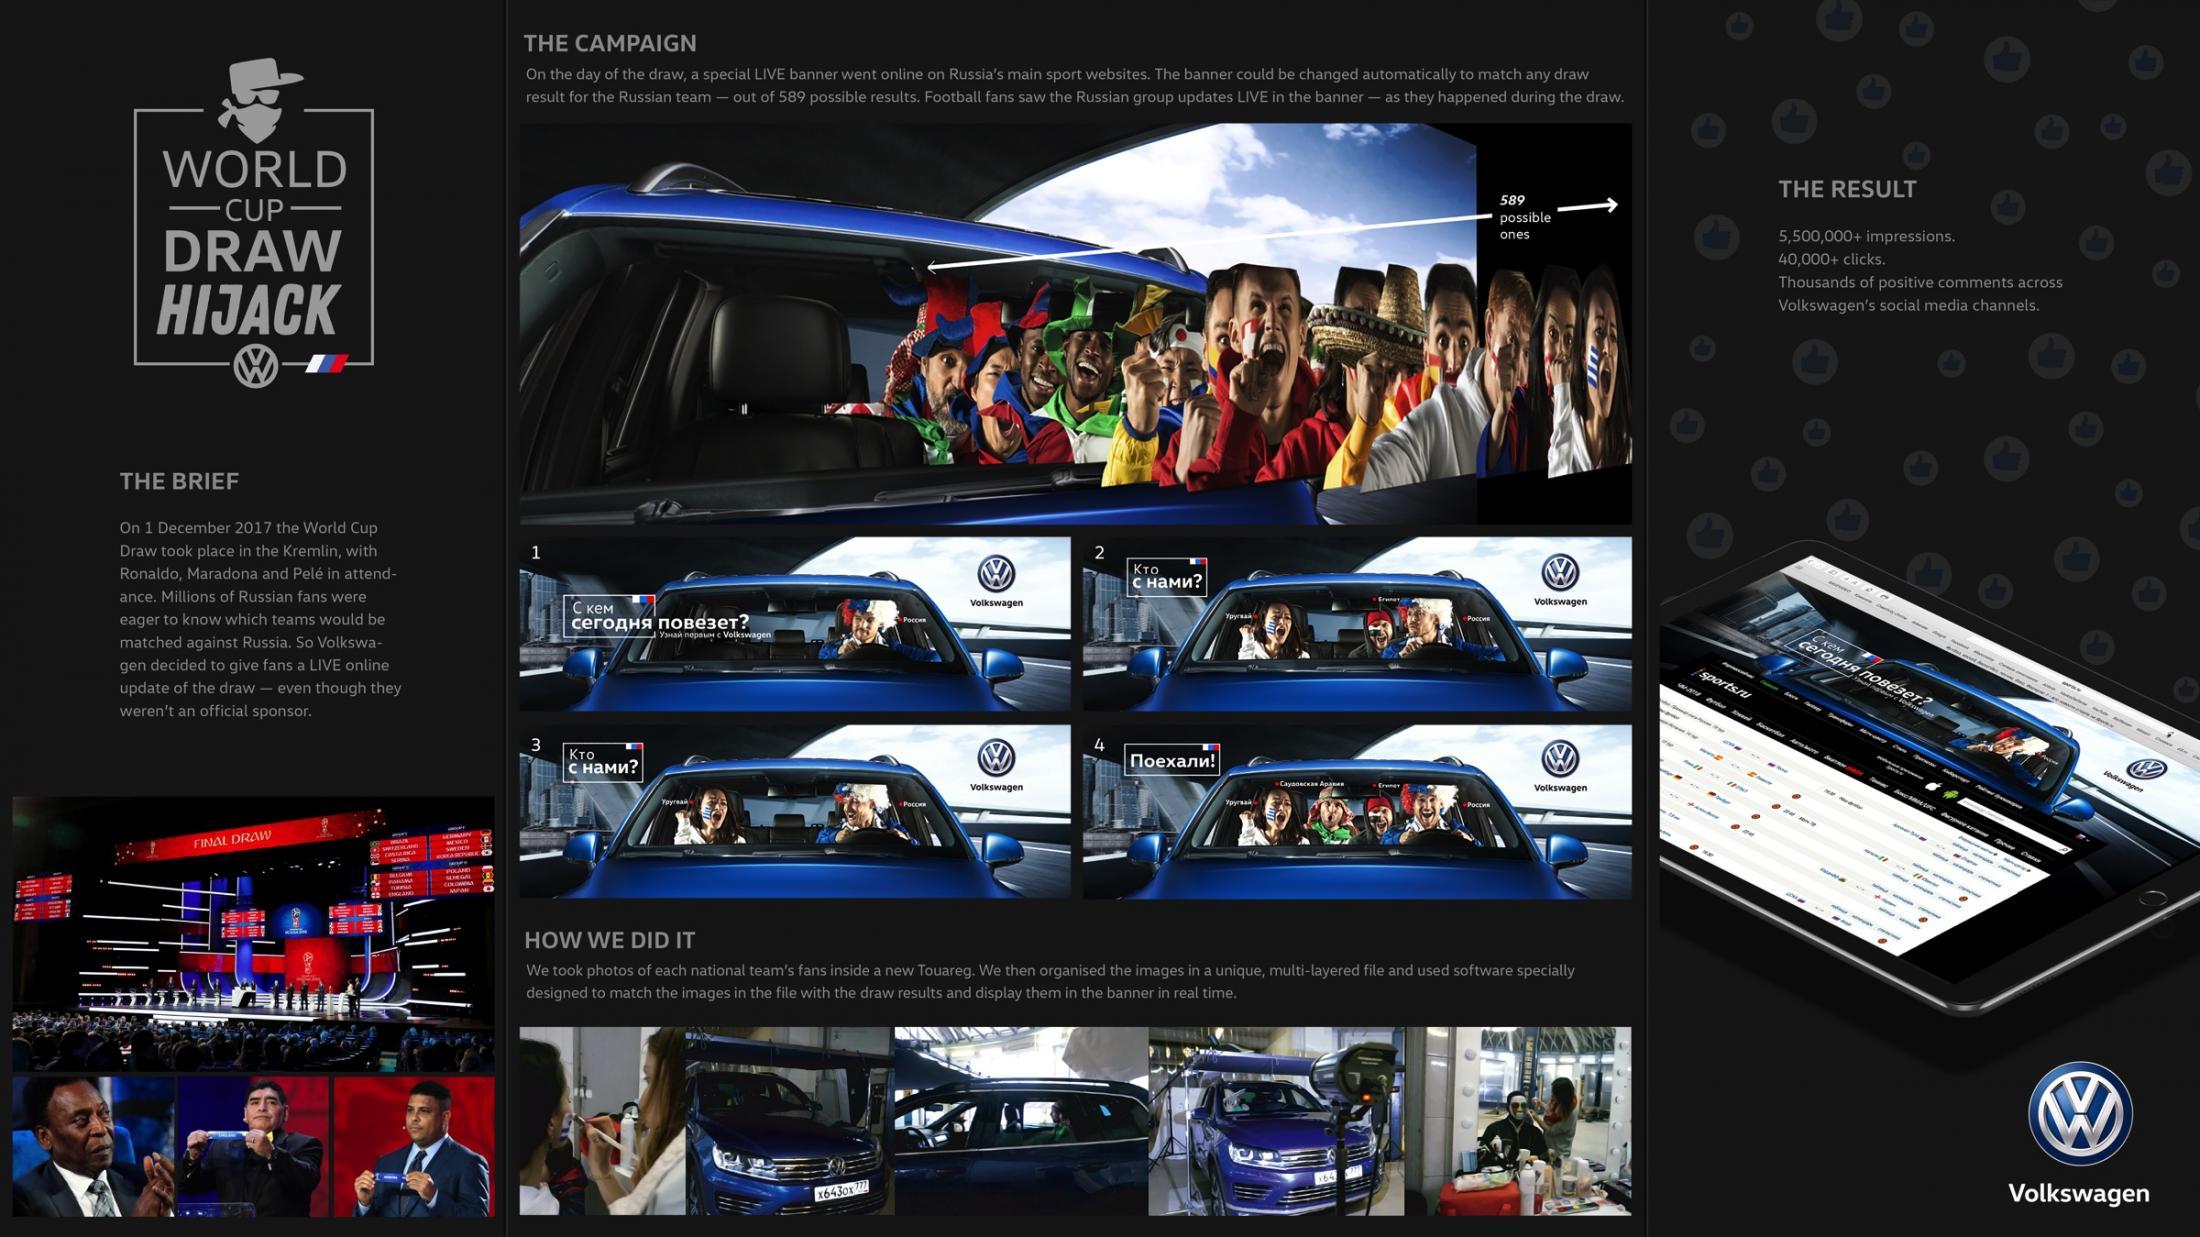 Volkswagen Digital Ad - World Cup Draw Hijack 2018